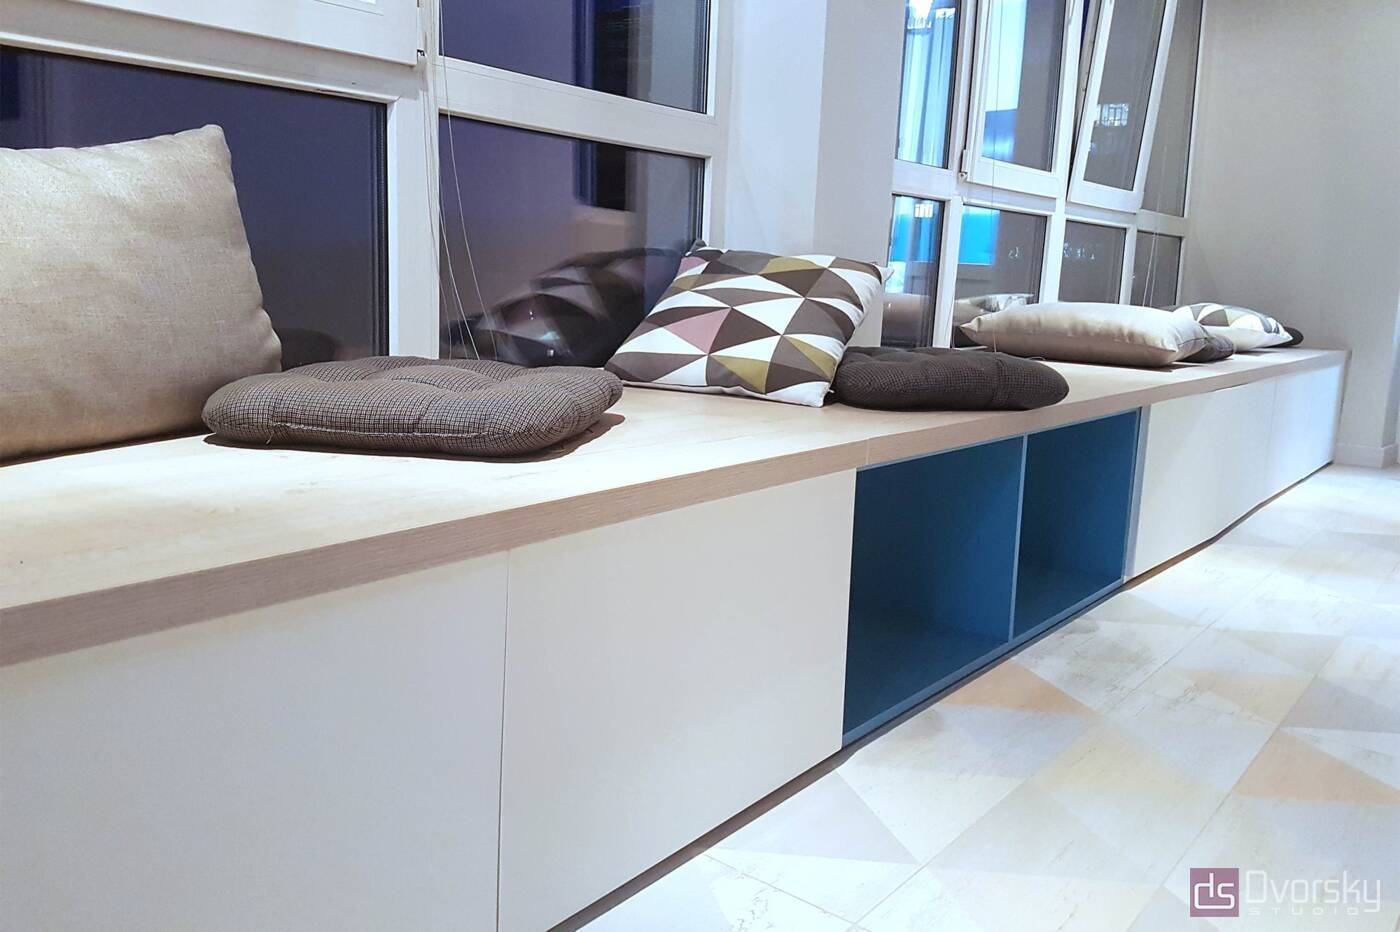 Мебель на балкон Тумбы для лоджии - Фото № 1